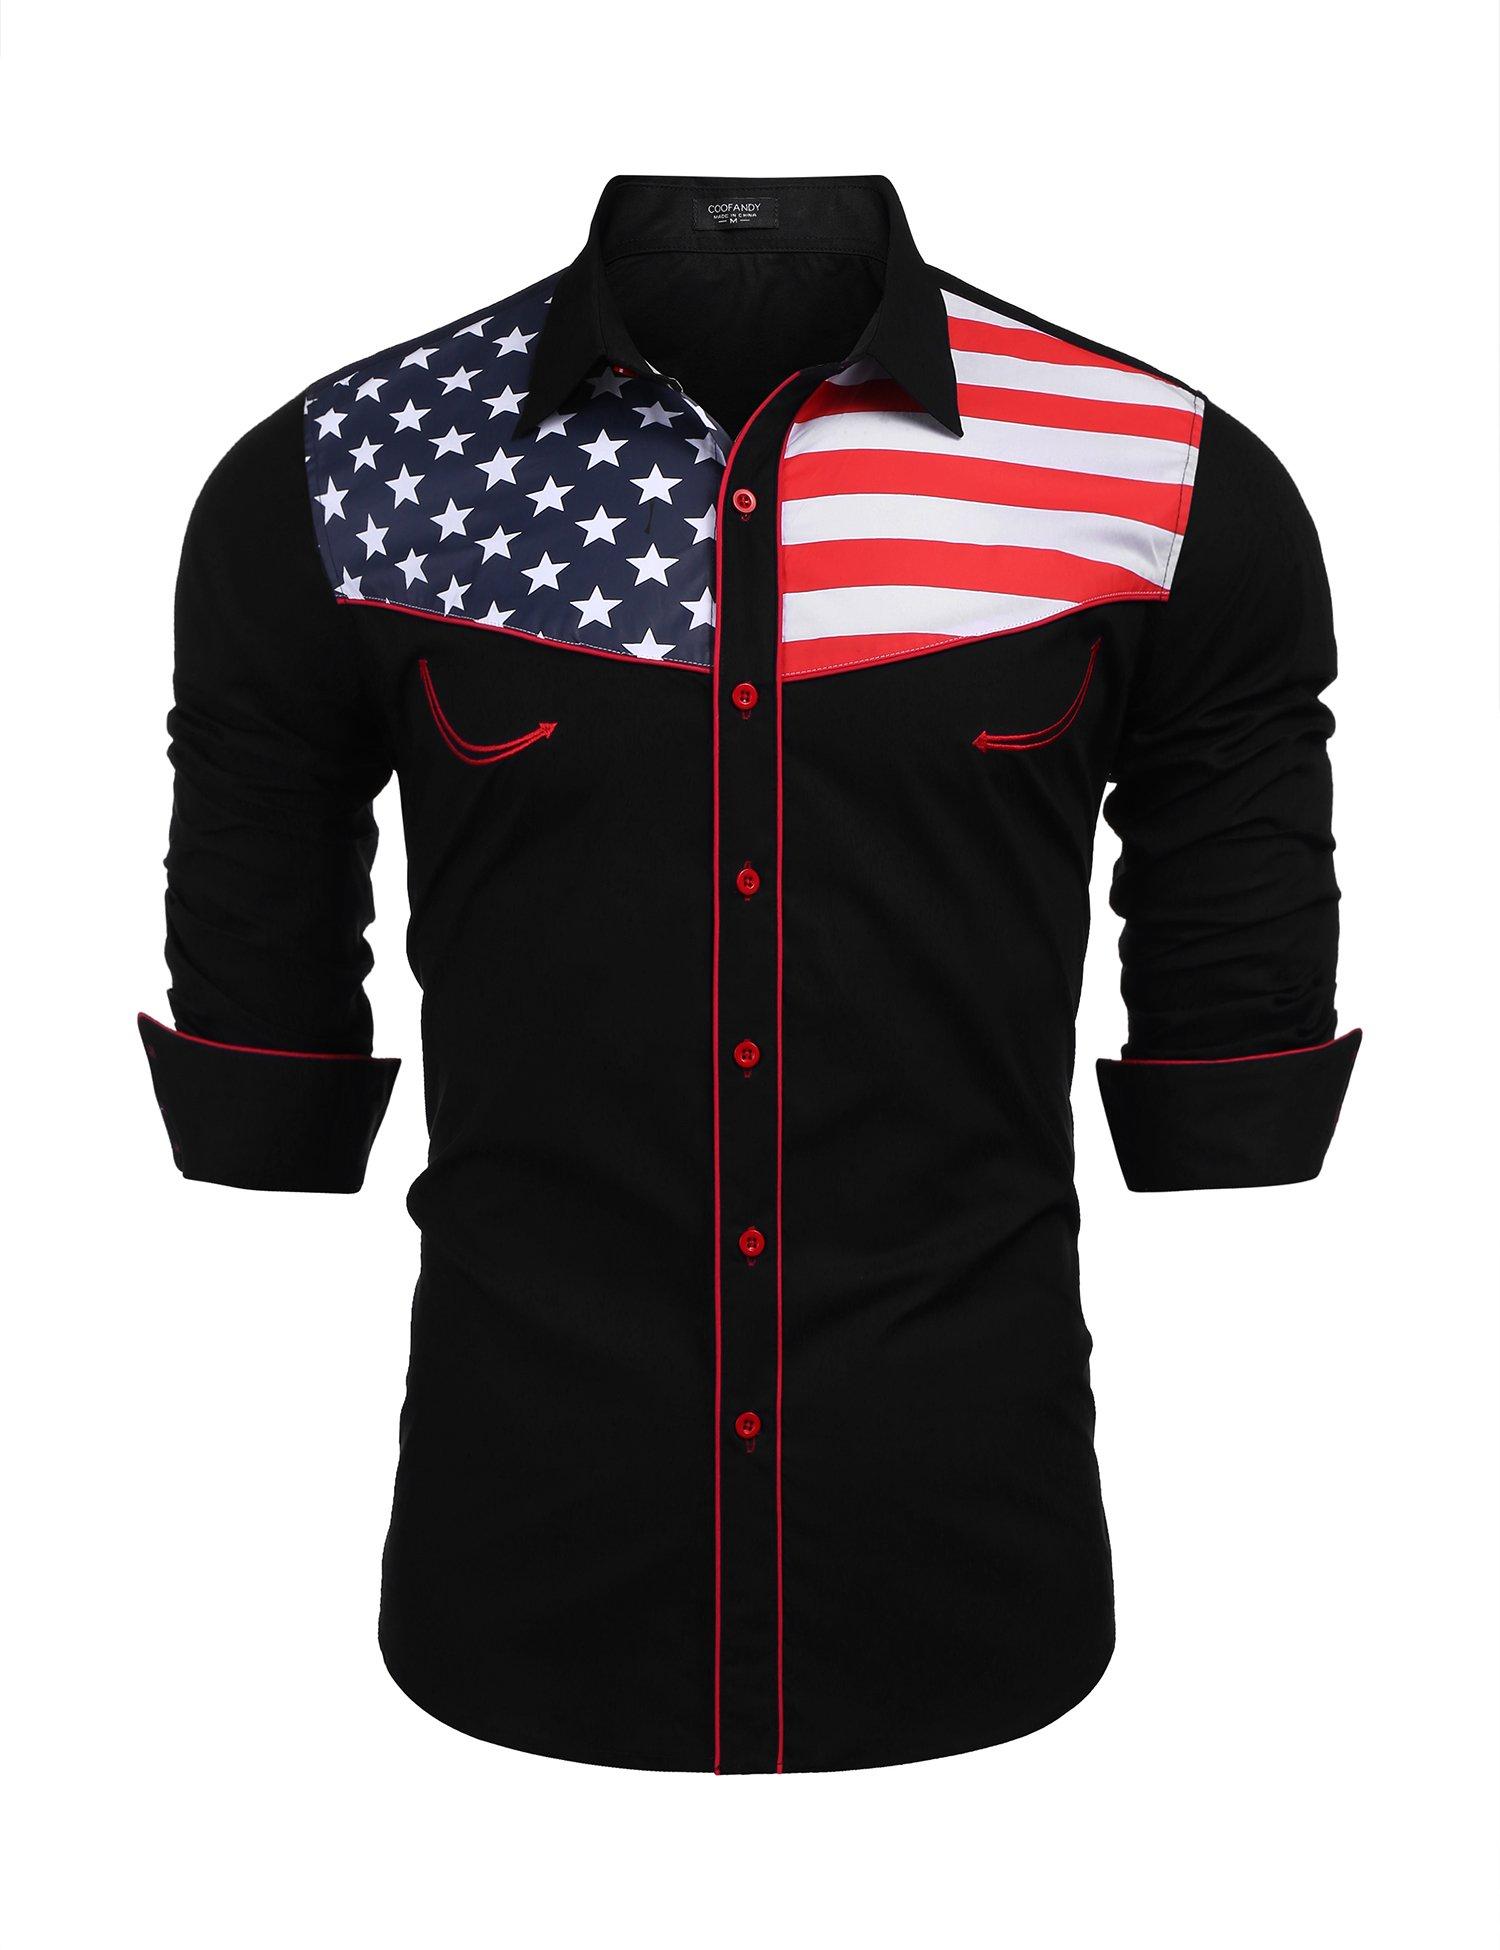 b97681b2a1d8 COOFANDY Men s Casual American Flag Button Down Shirts Slim Fit Long Sleeve  Shirt